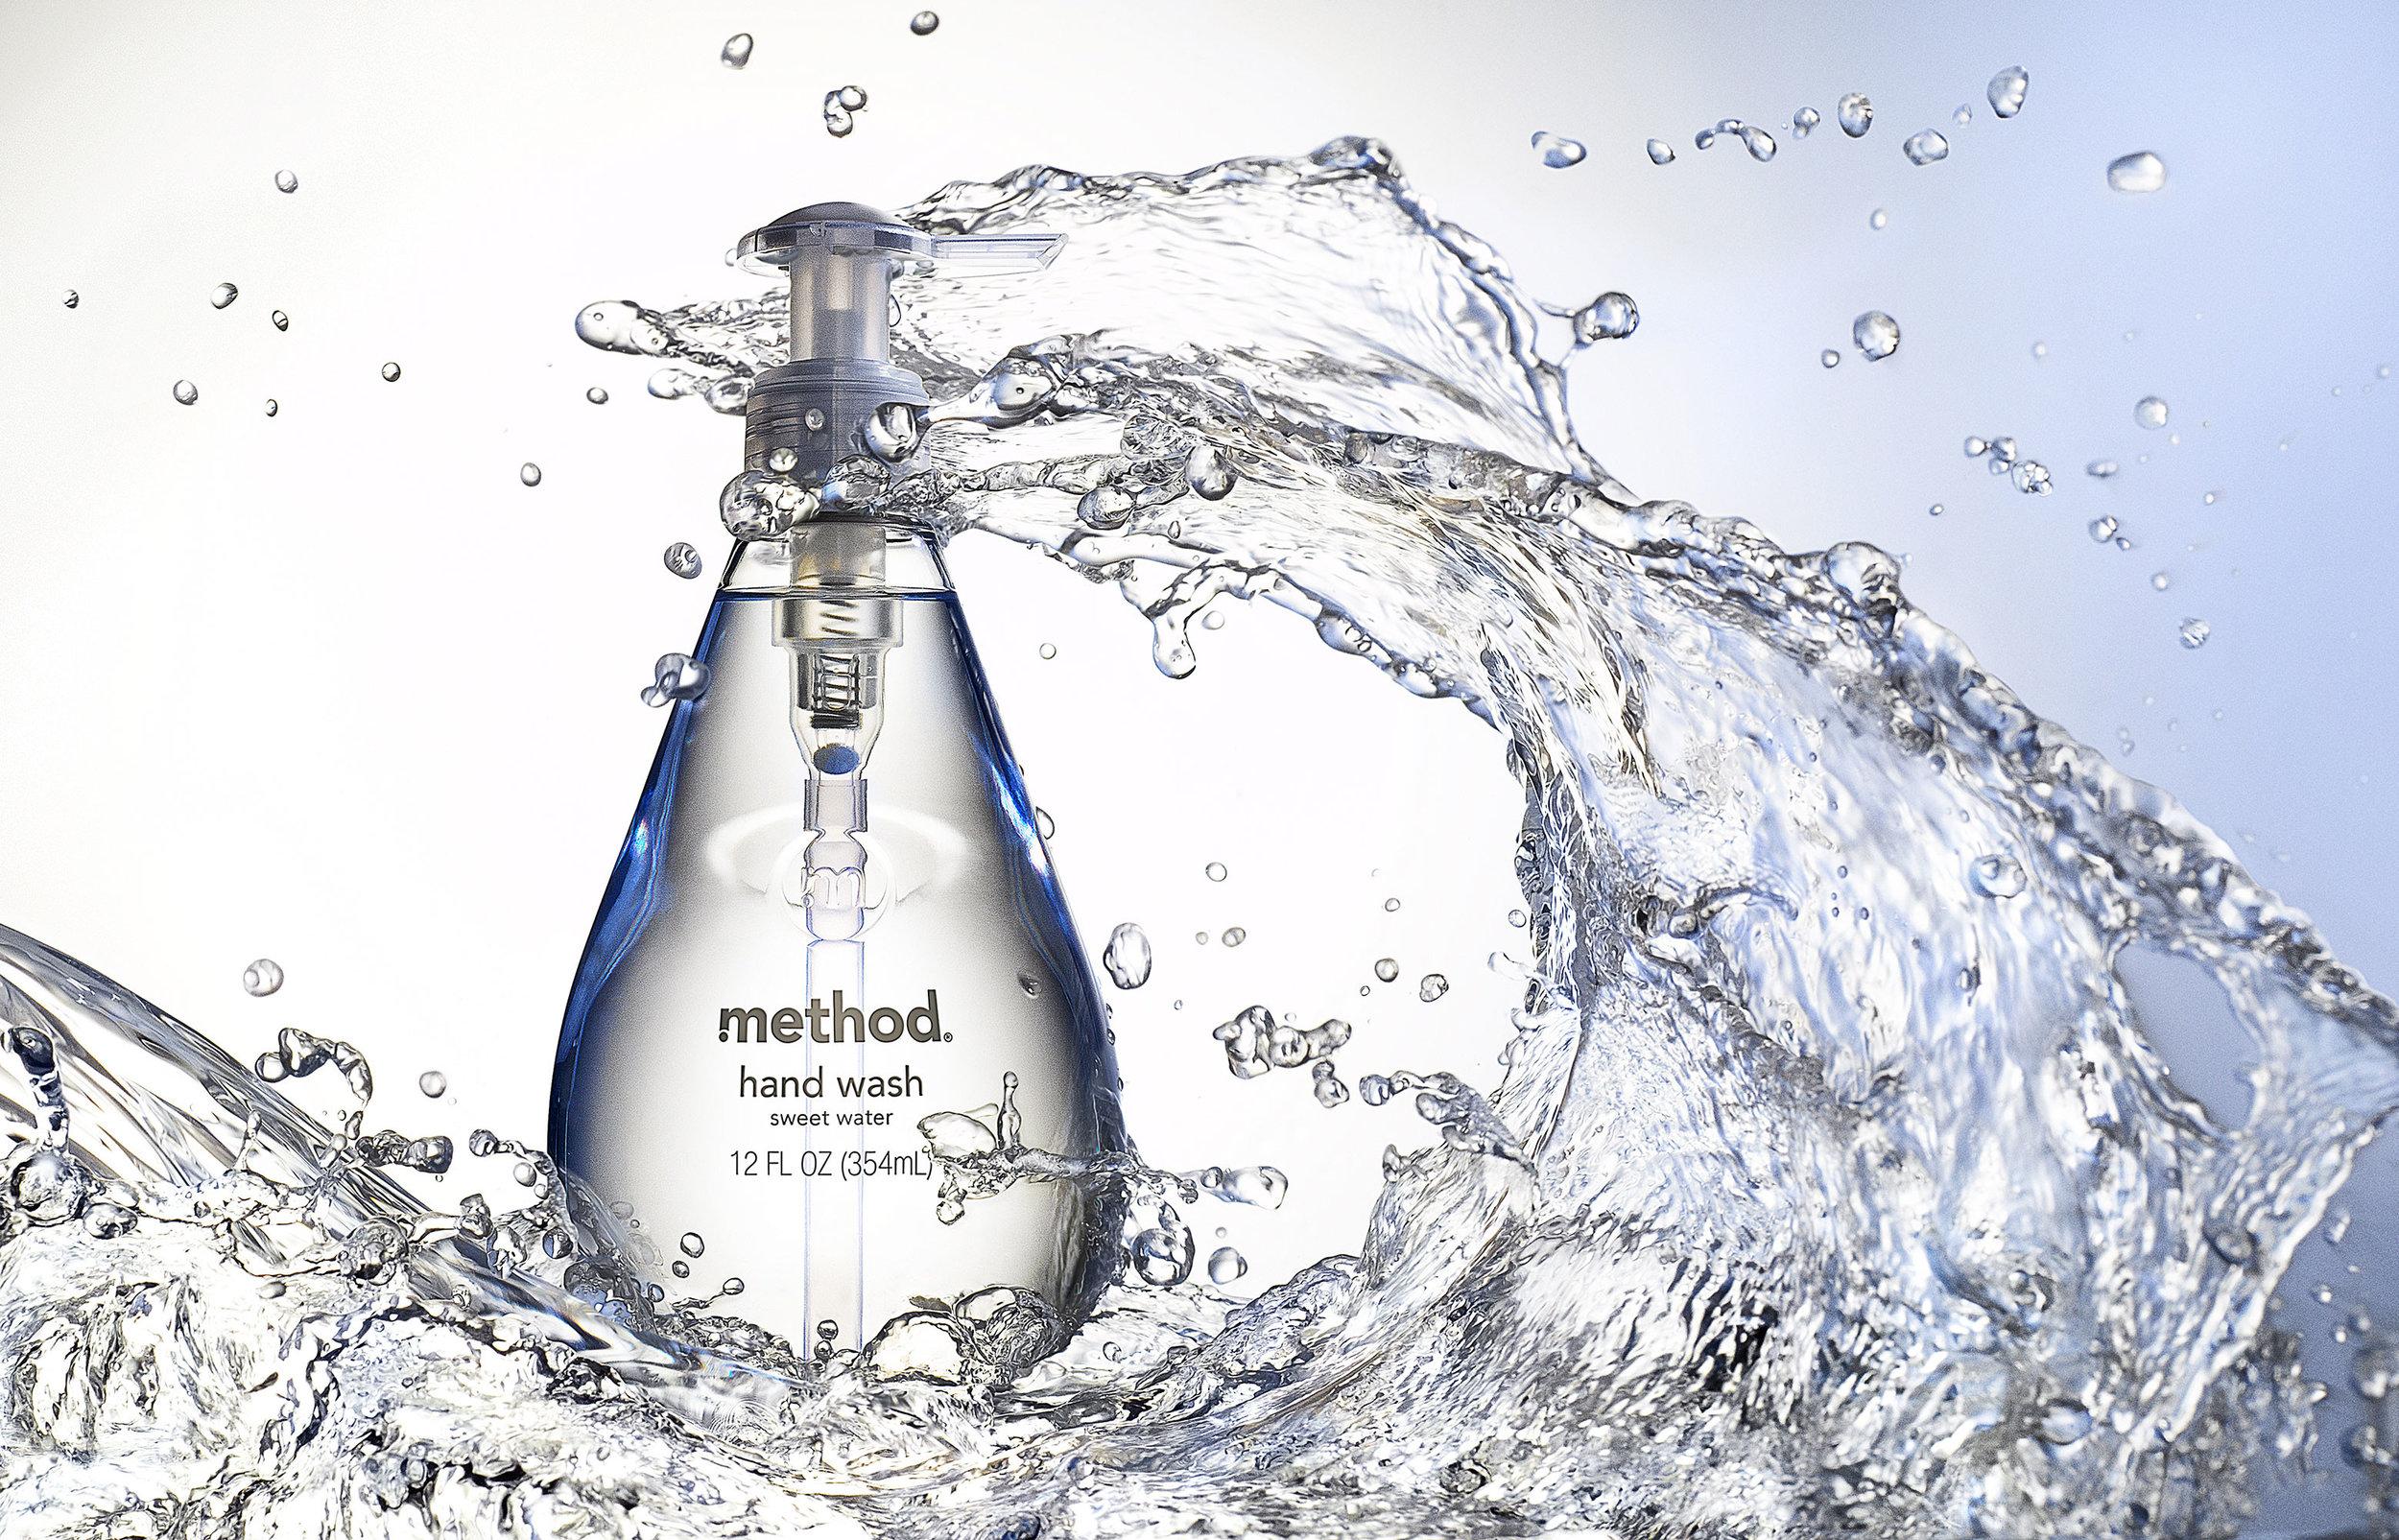 Methodwatercr-3116x2000.jpg